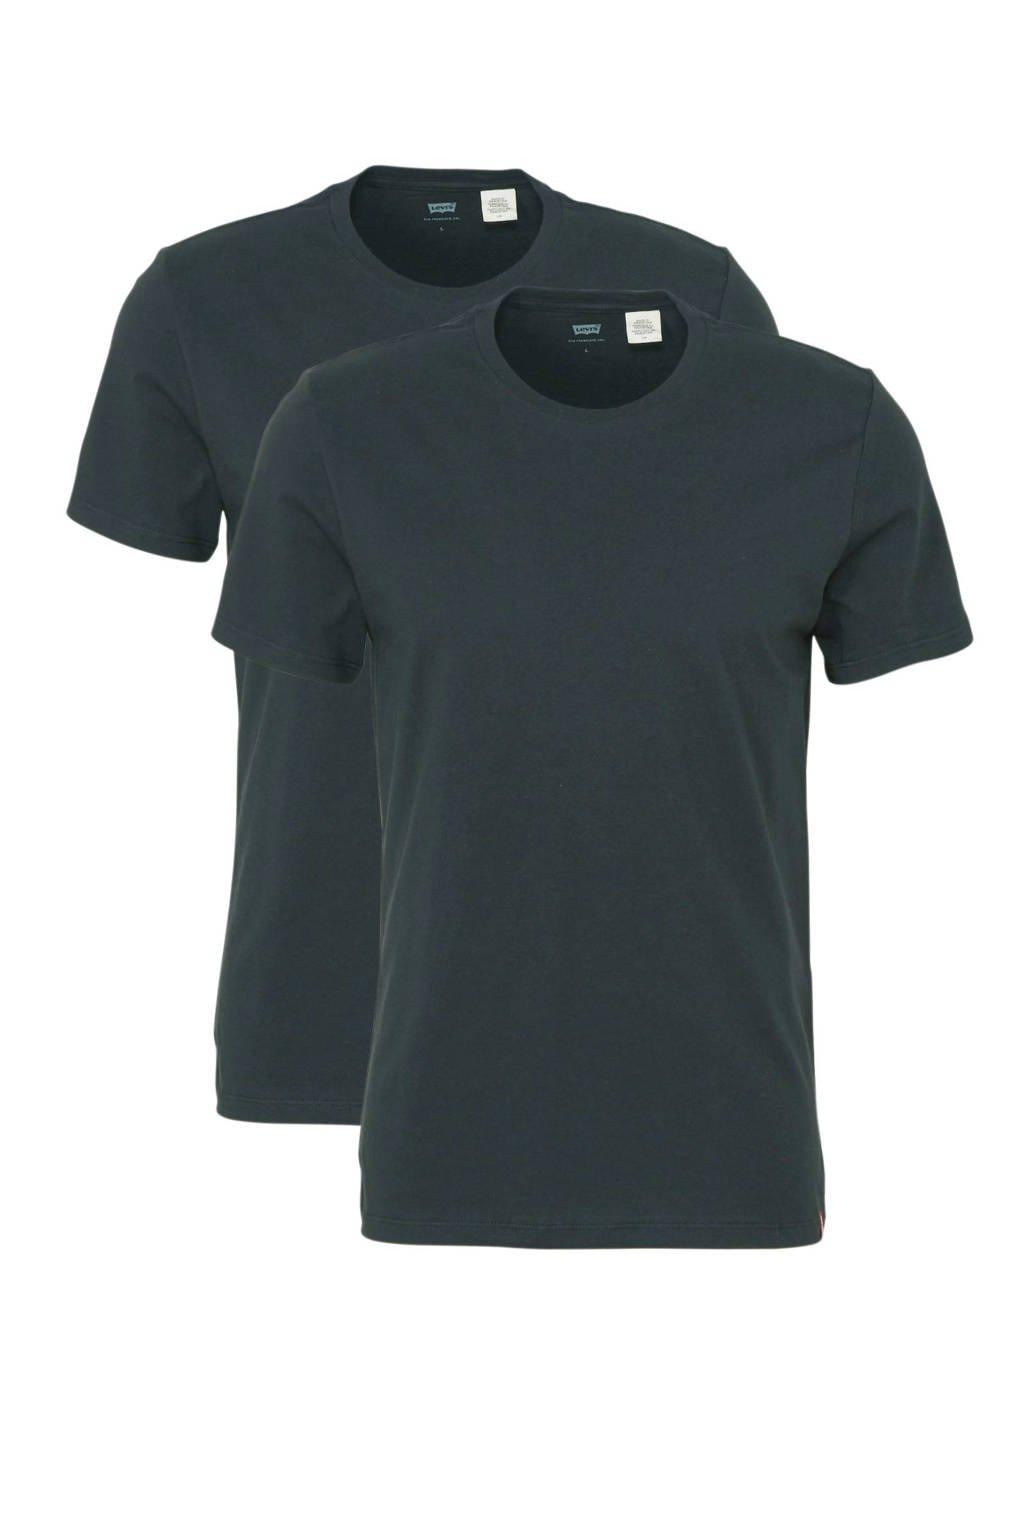 Levi's T-shirt - set van 2, Zwart